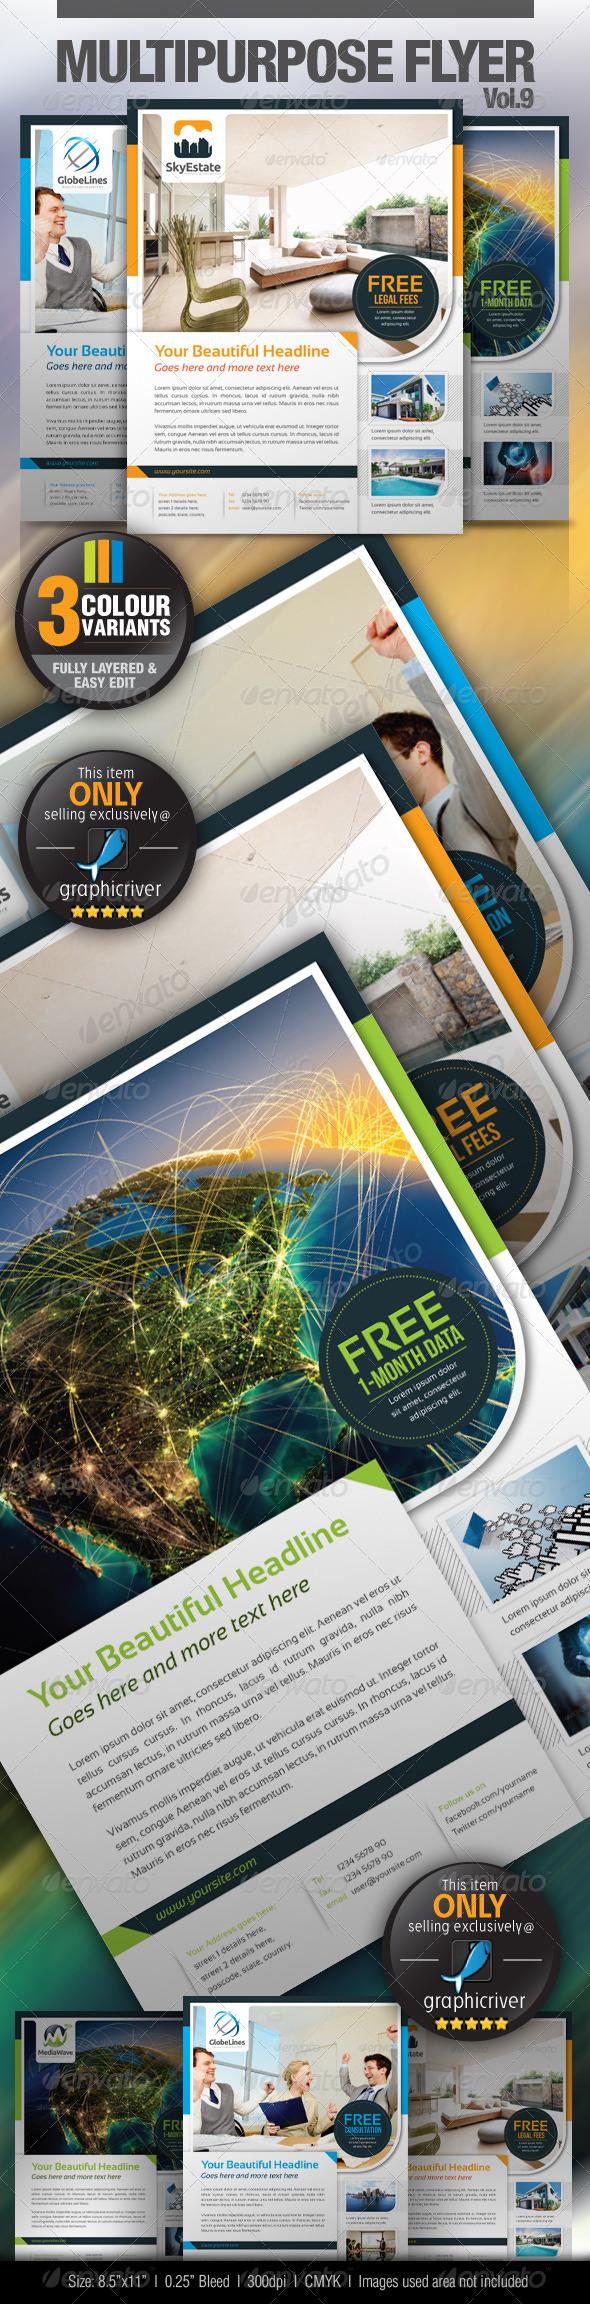 GraphicRiver Multipurpose Business Flyer Vol.9 3919253